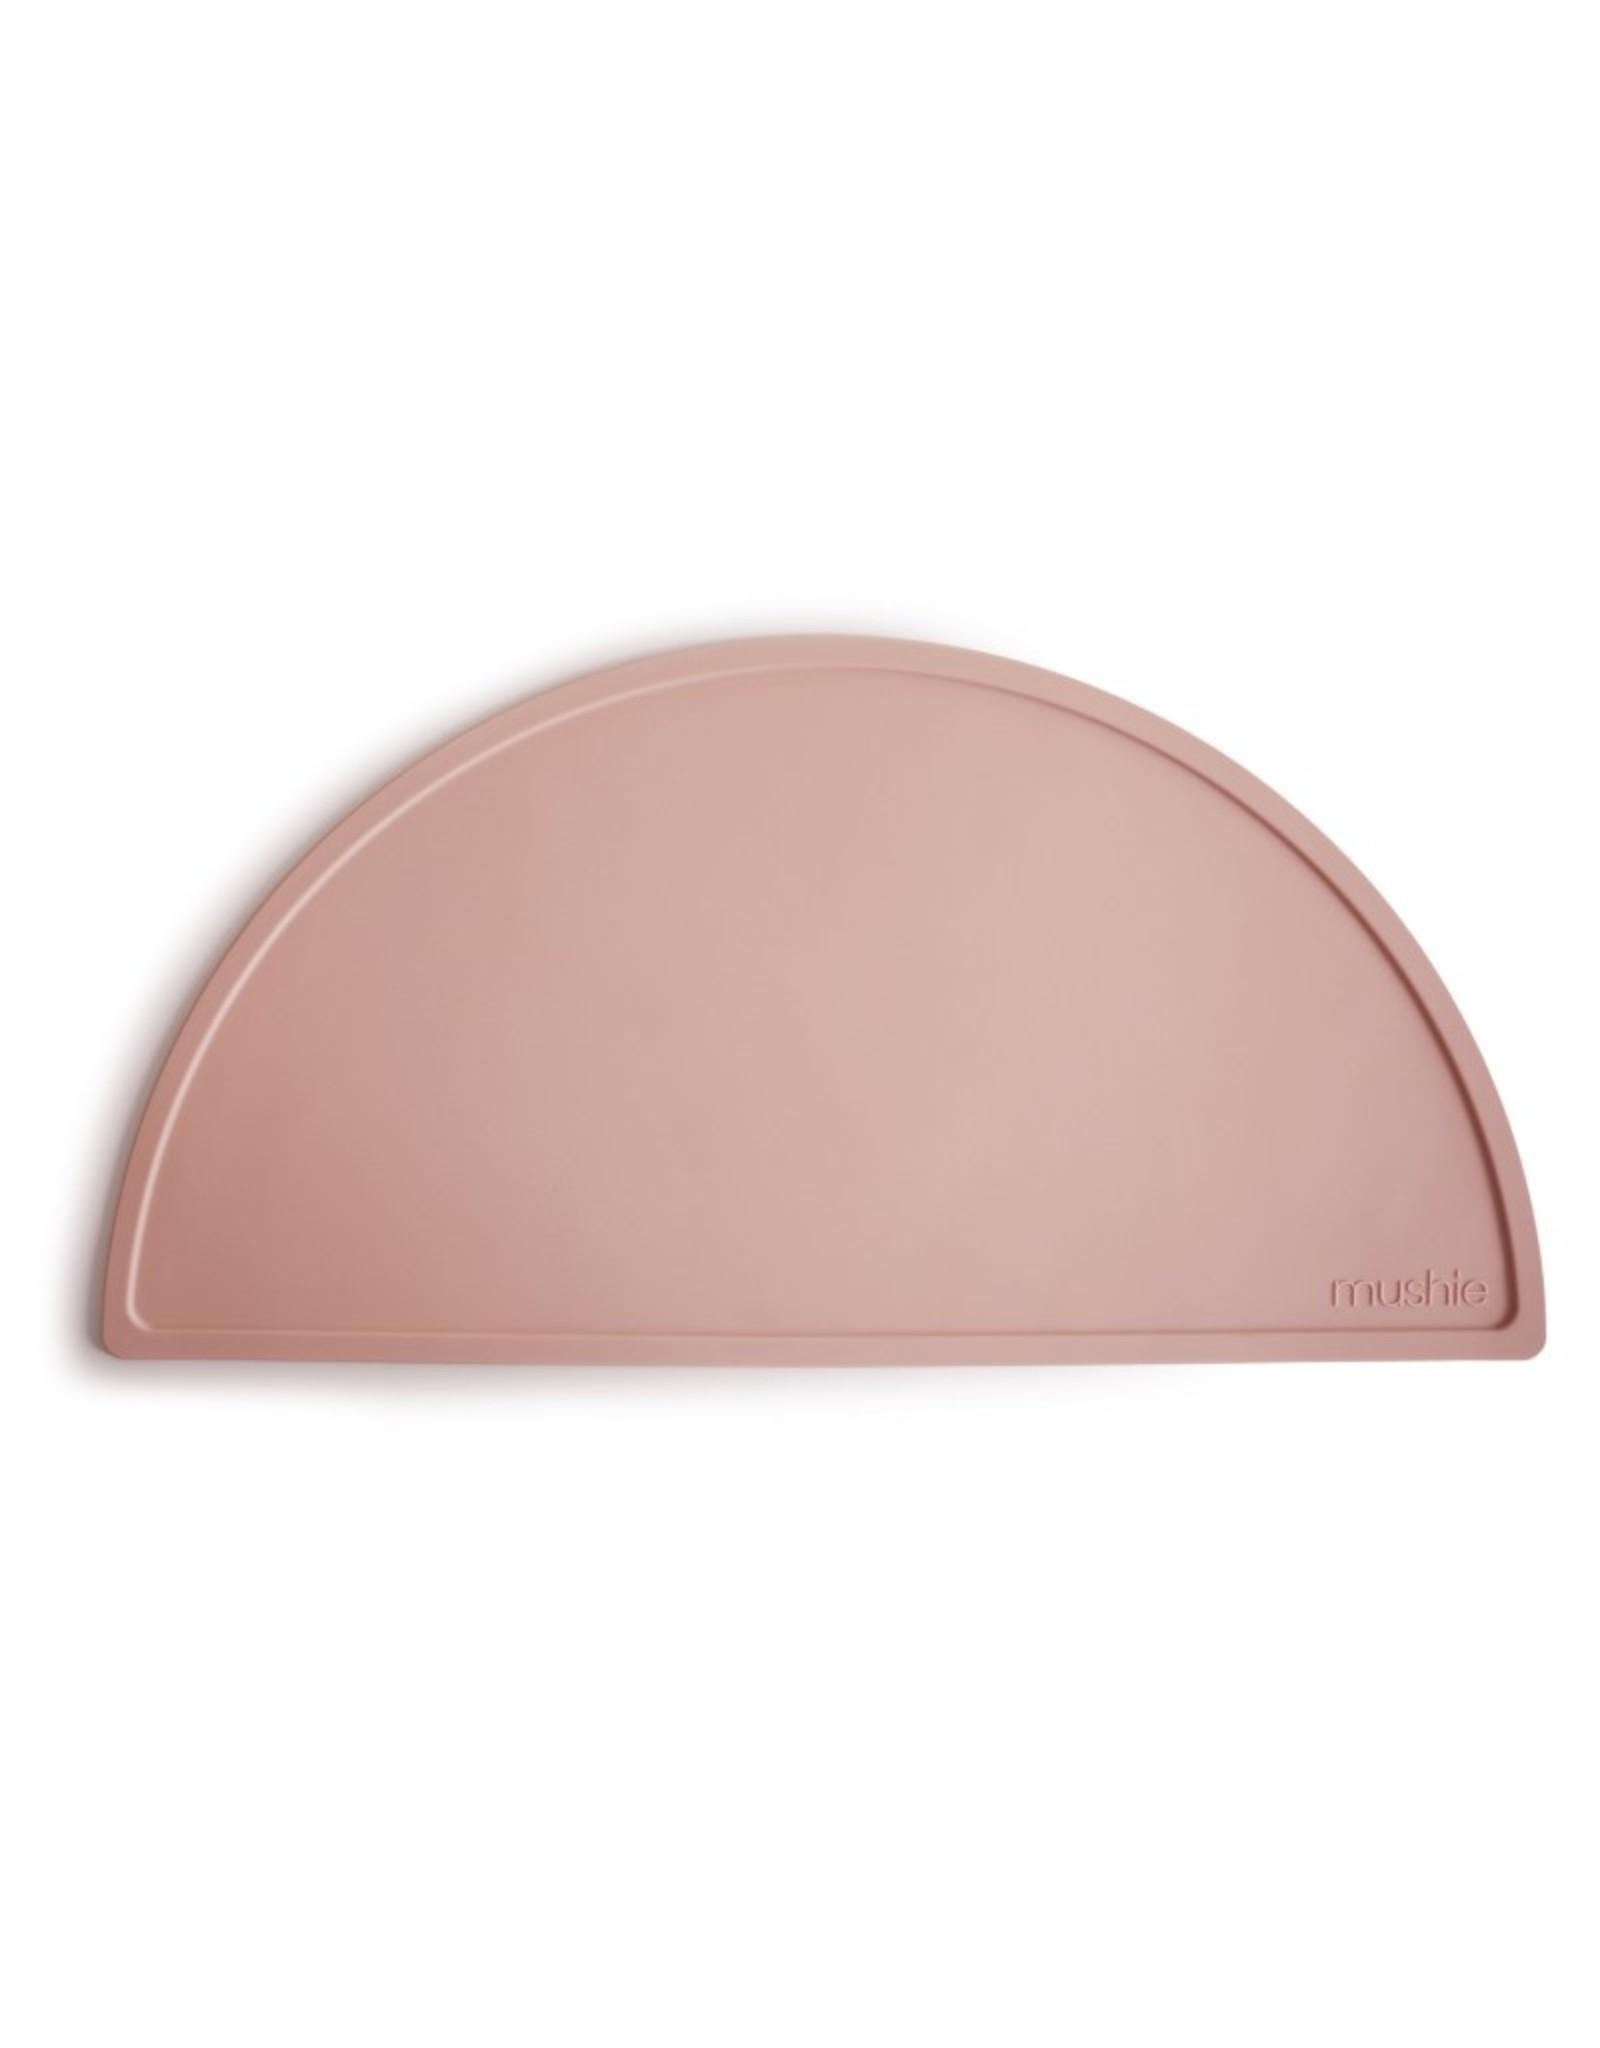 BIBS / mushie Set de table en silicone - blush